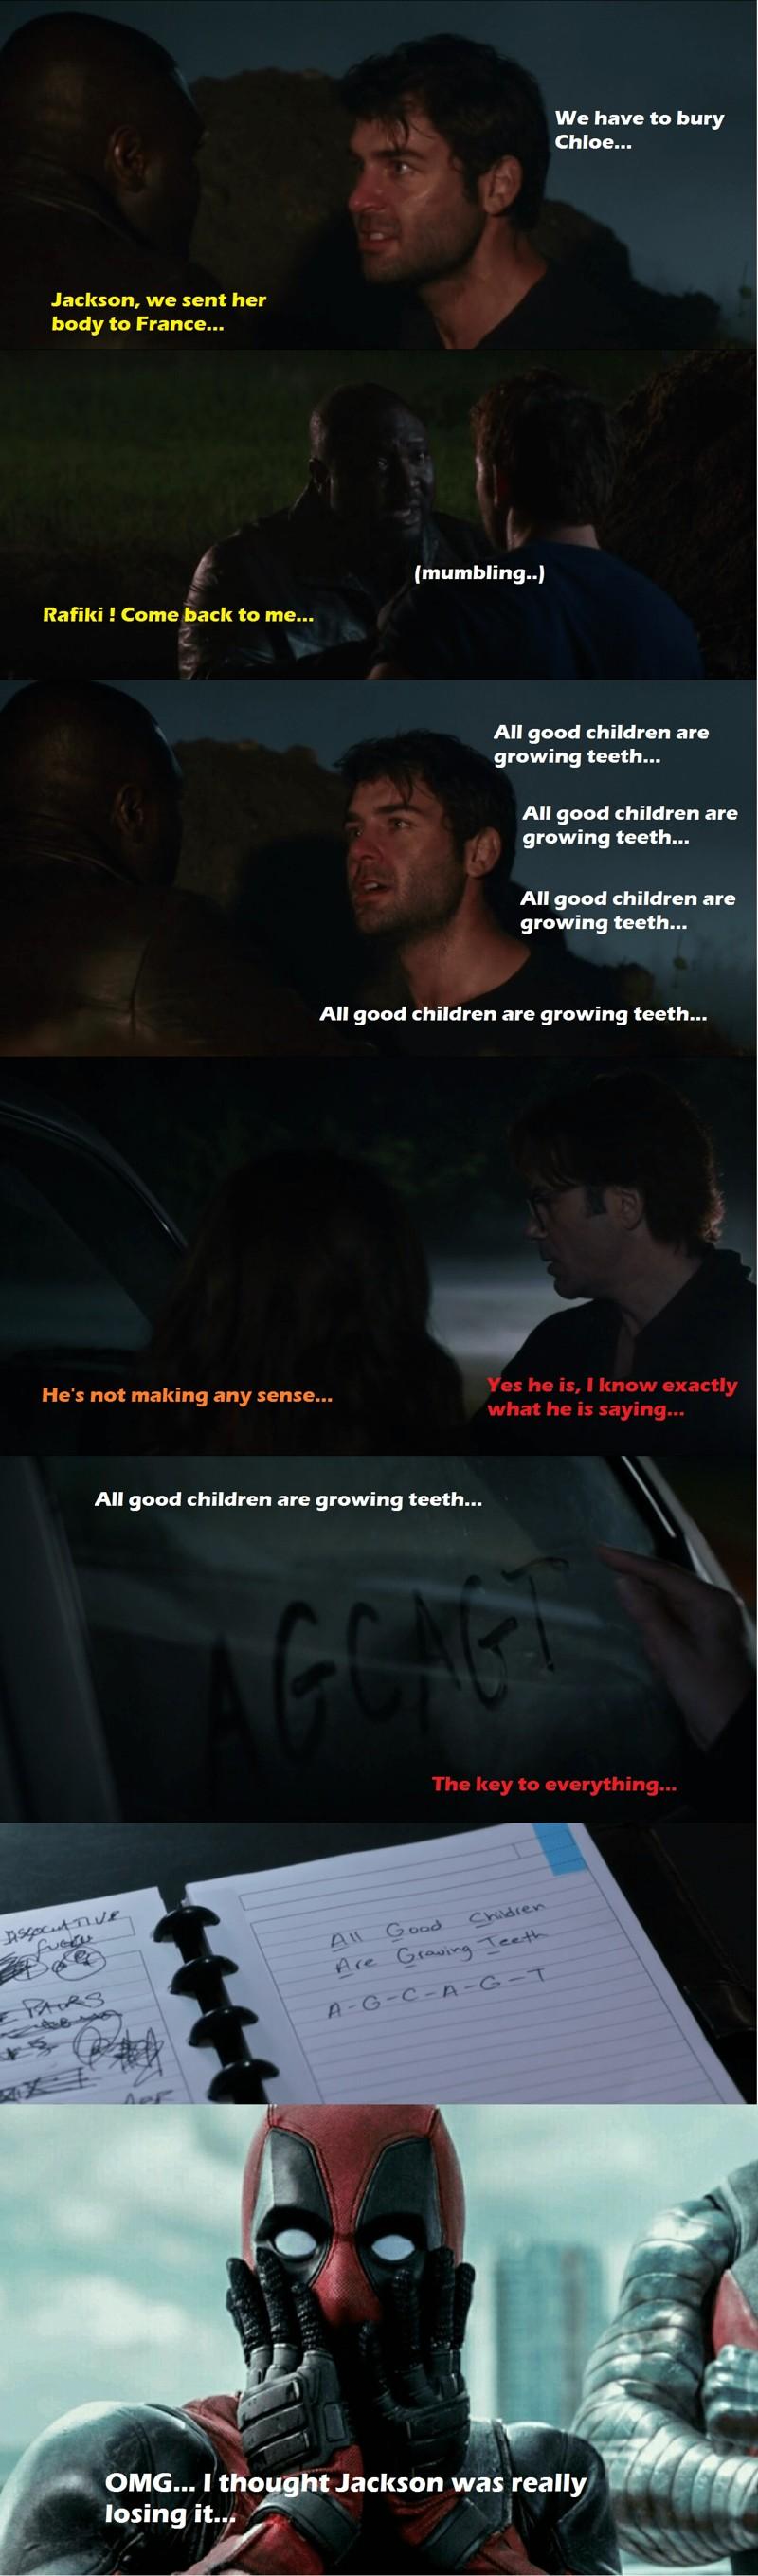 Poor Jackson :'(